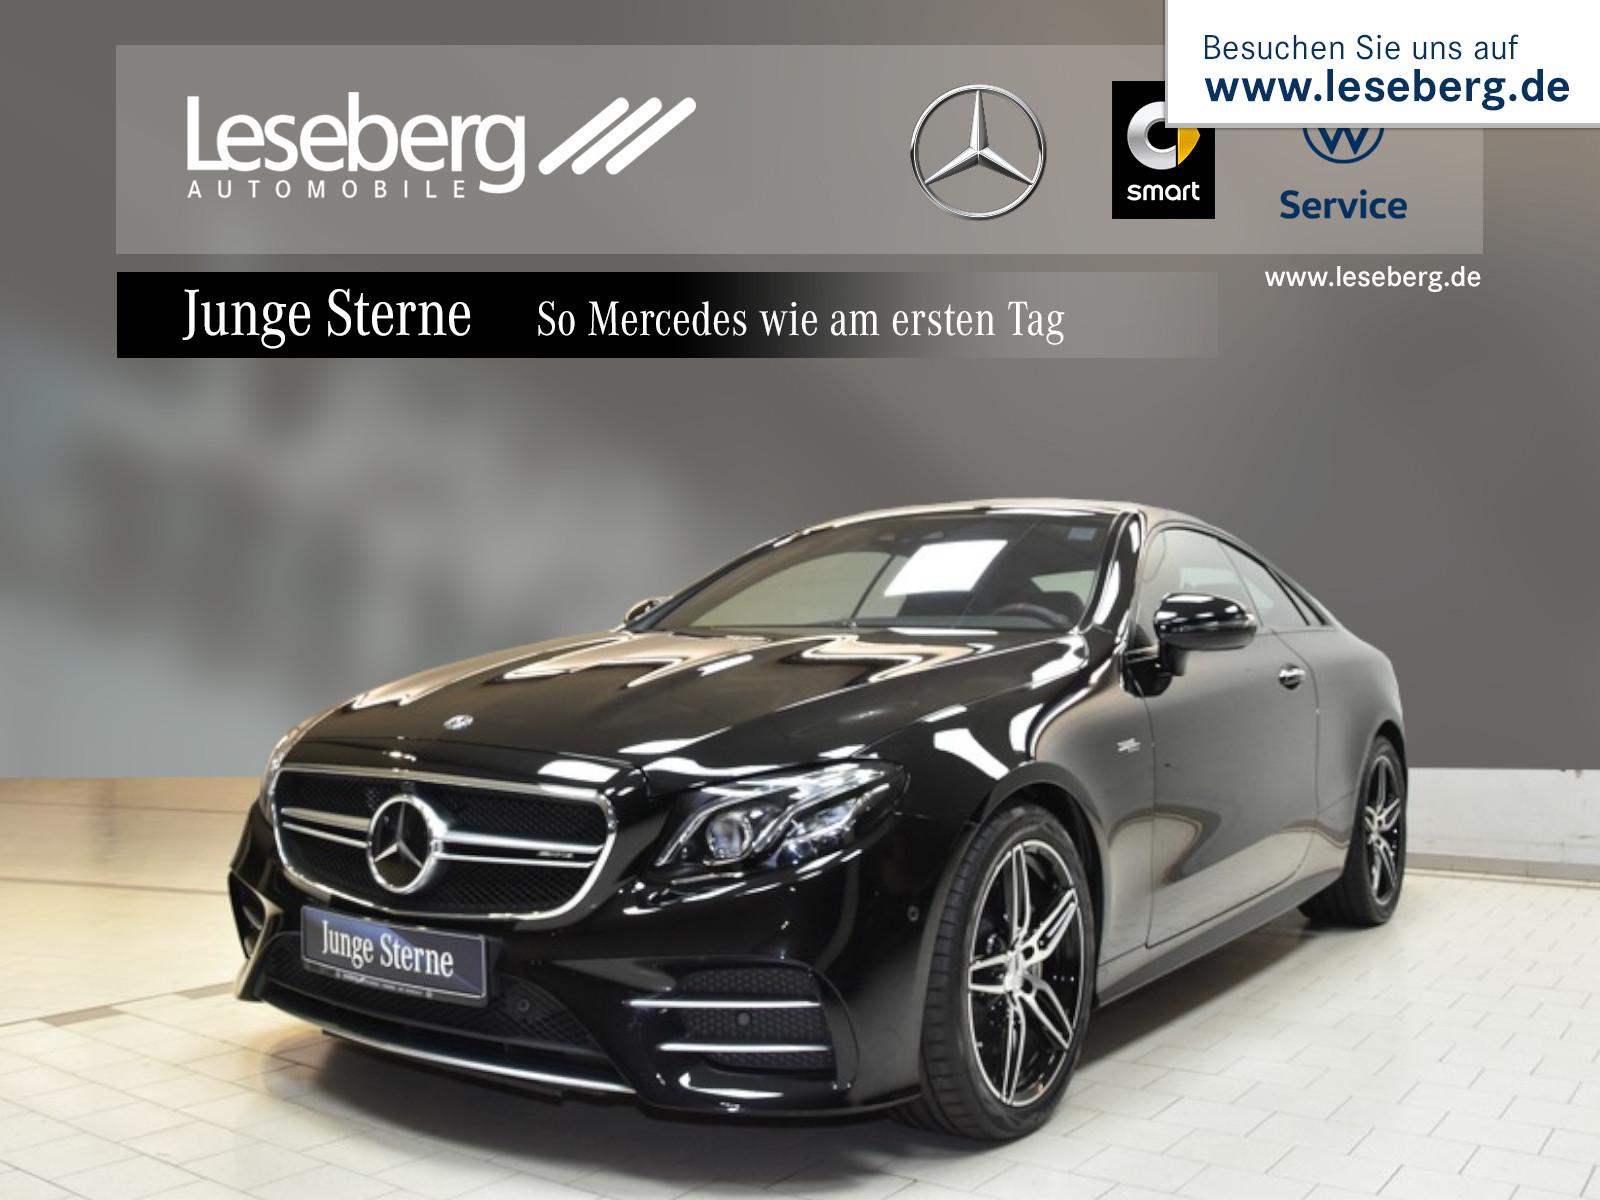 Mercedes-Benz Mercedes-AMG E 53 4M+ Coupé Pano/Distr/Multibeam, Jahr 2018, Benzin